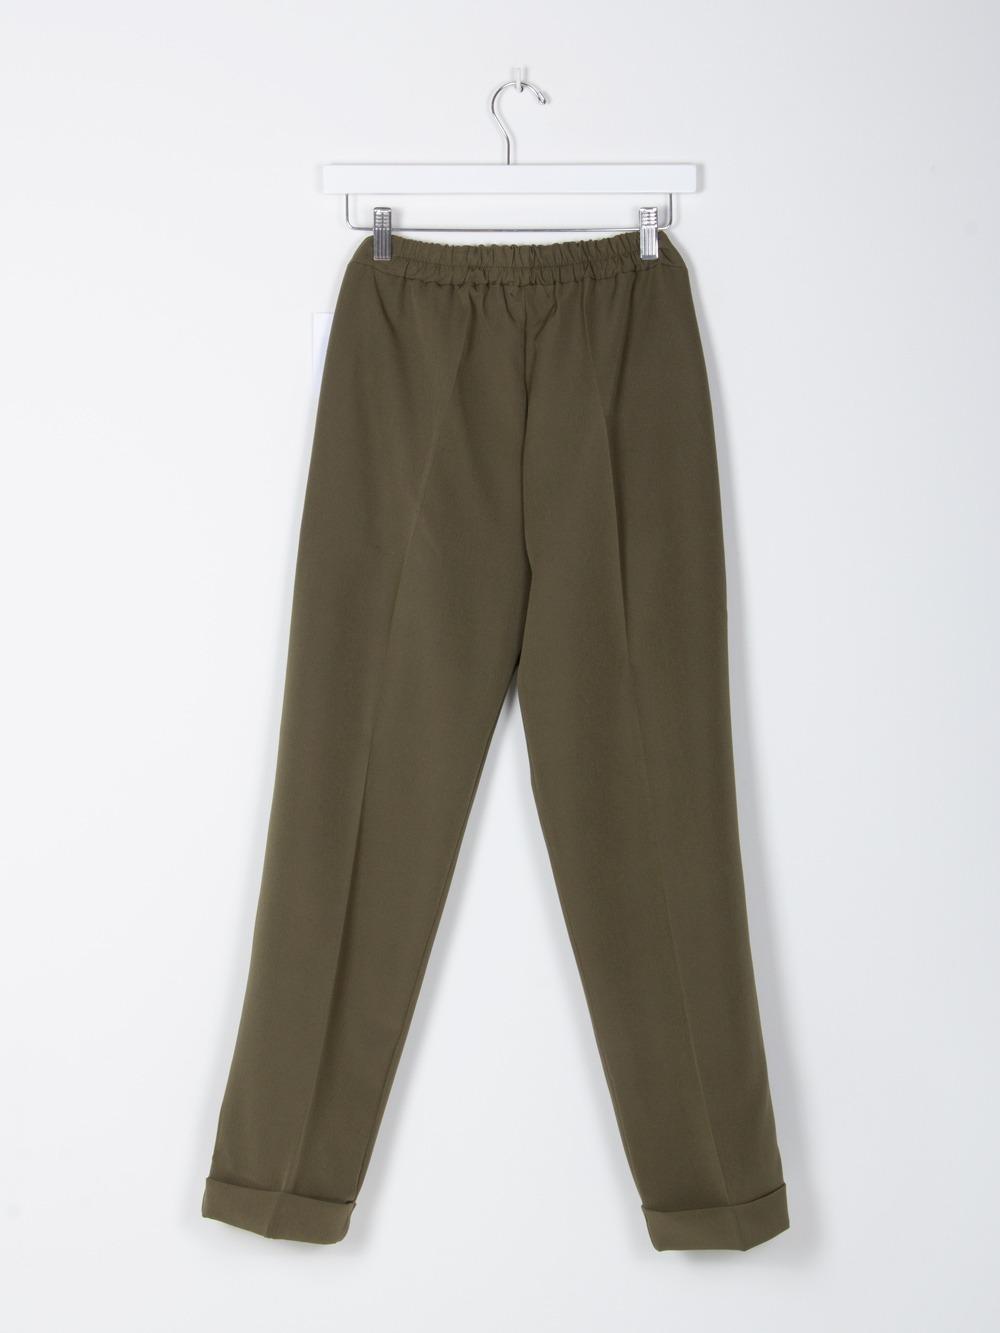 Pantalón mujer wide leg cintura elastica Caqui